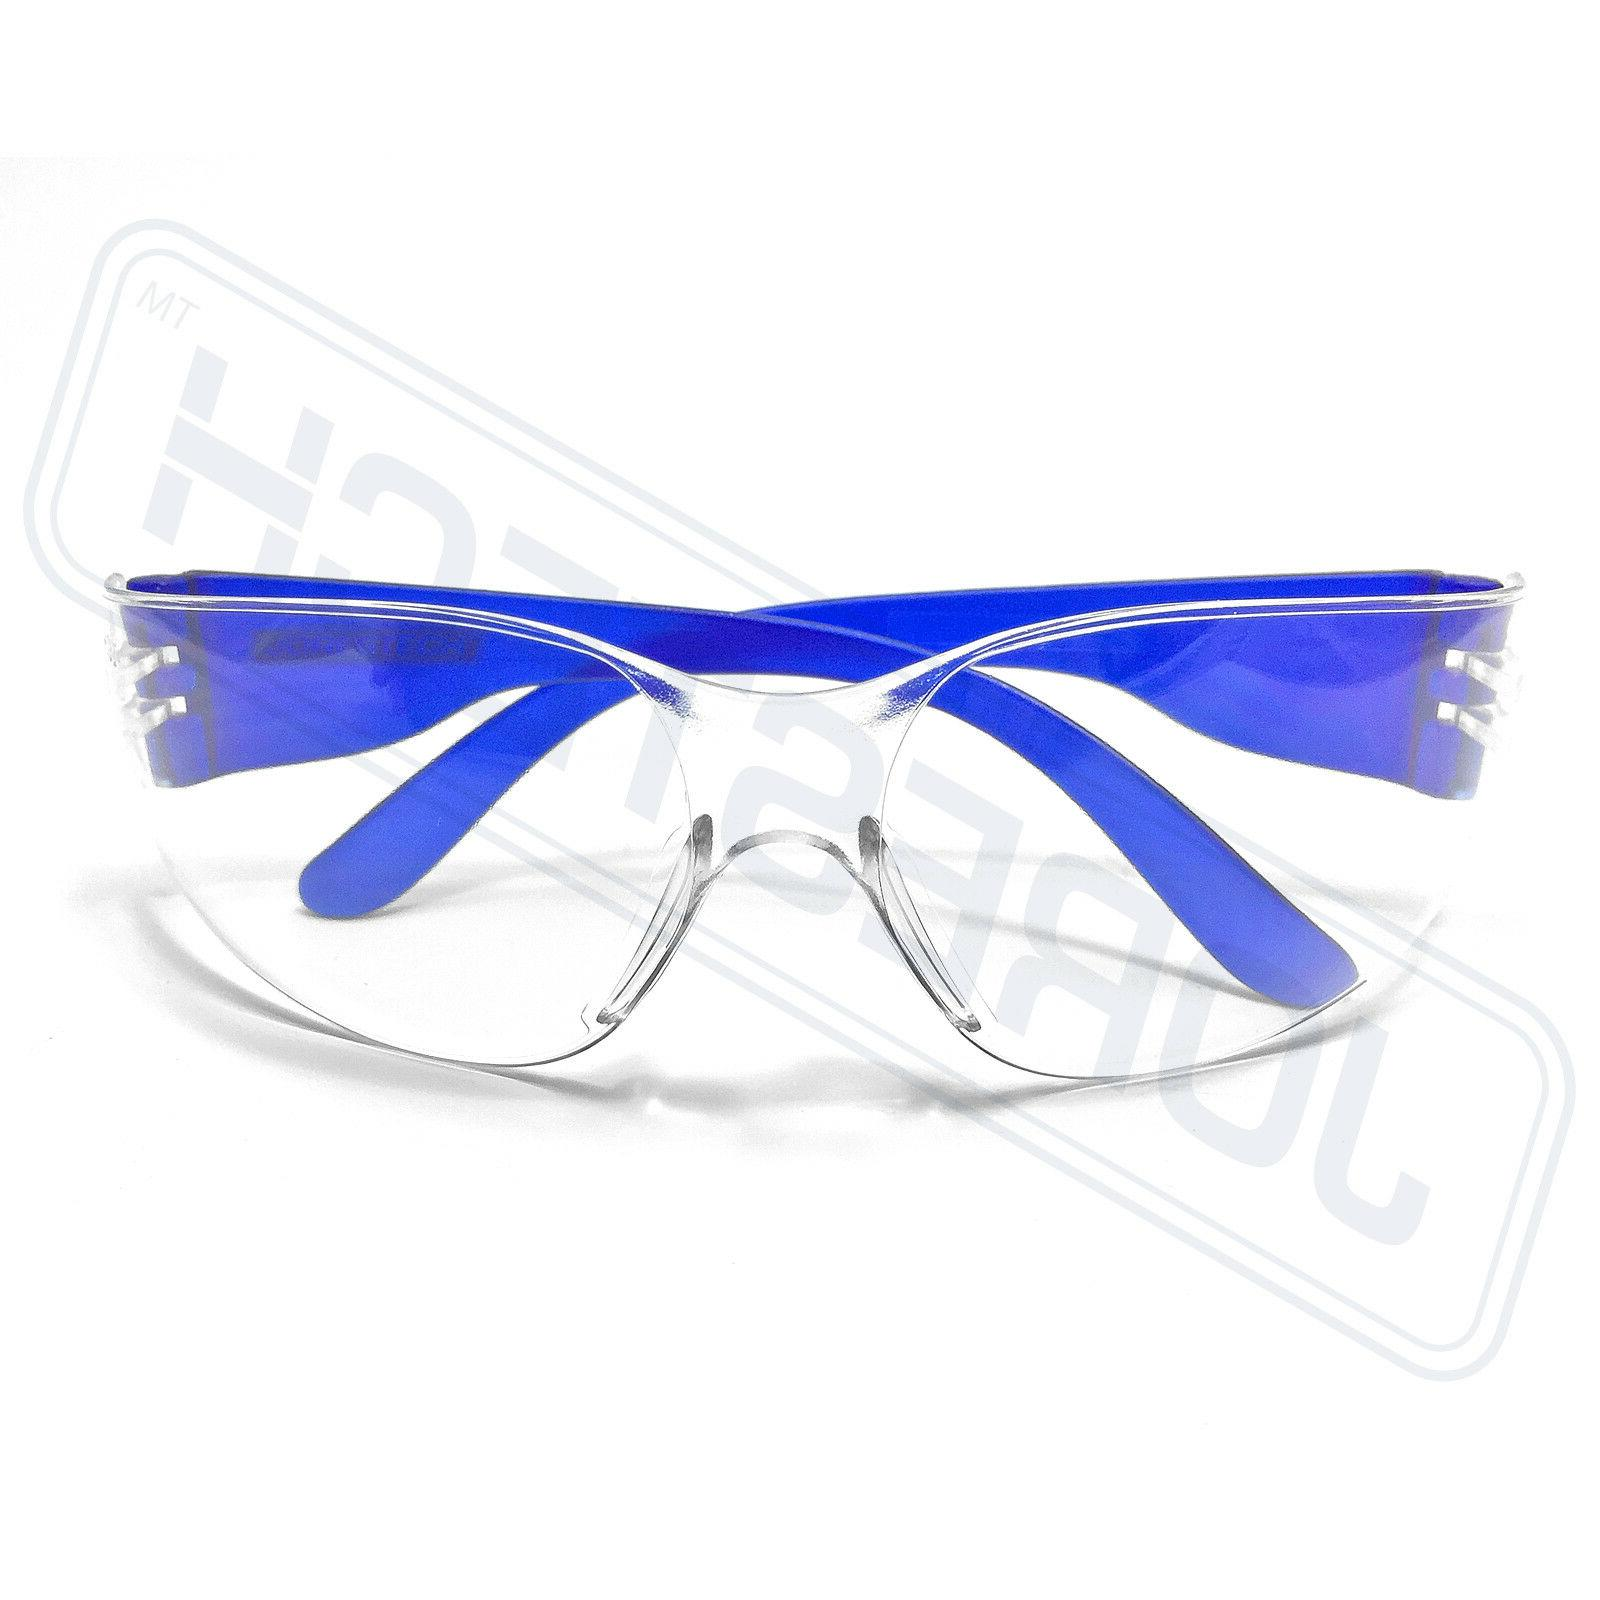 JORESTECH Blue clear Lens Sunglasses